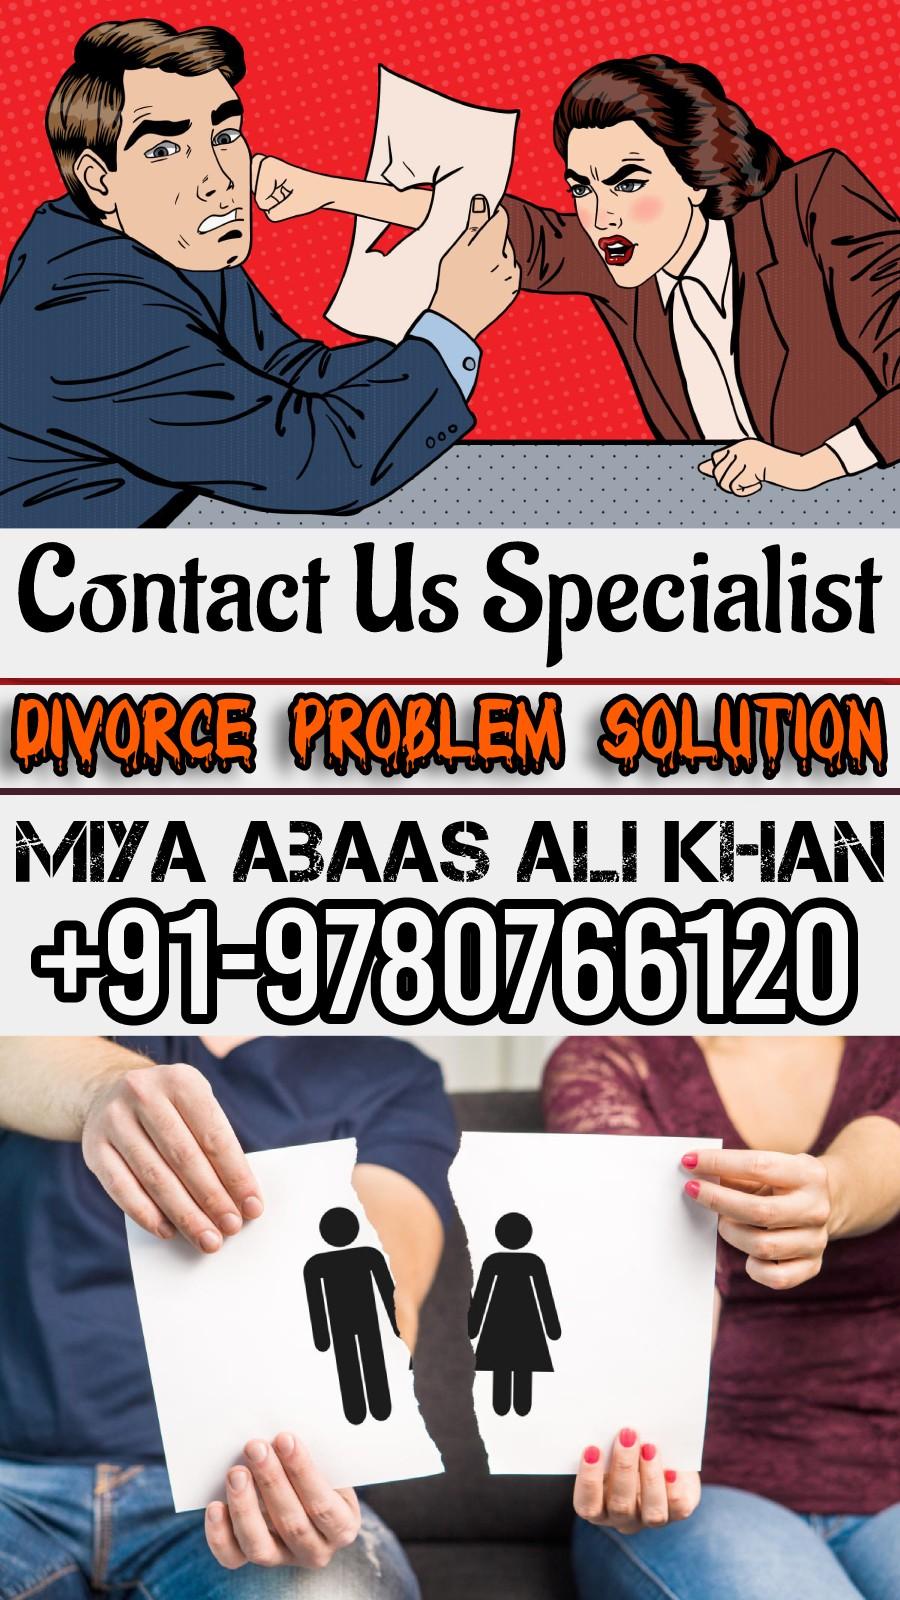 Miya Abaas Ali Khan